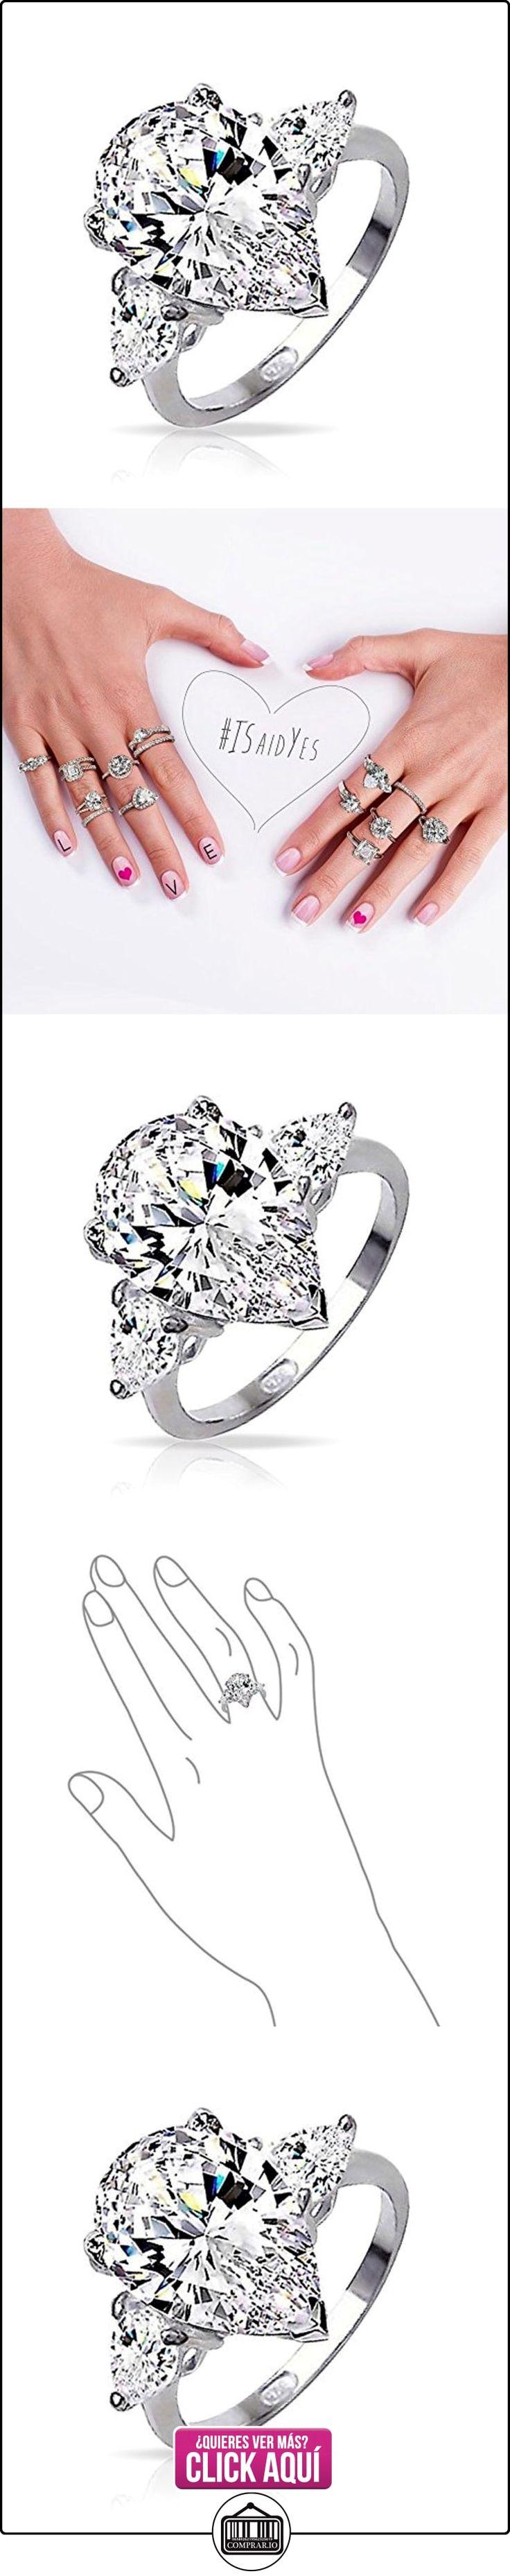 Bling Jewelry Plata Esterlina 3 Piedra Clásica forma de Pera CZ Anillo de Compromiso  ✿ Joyas para mujer - Las mejores ofertas ✿ ▬► Ver oferta: https://comprar.io/goto/B004AWJW6M